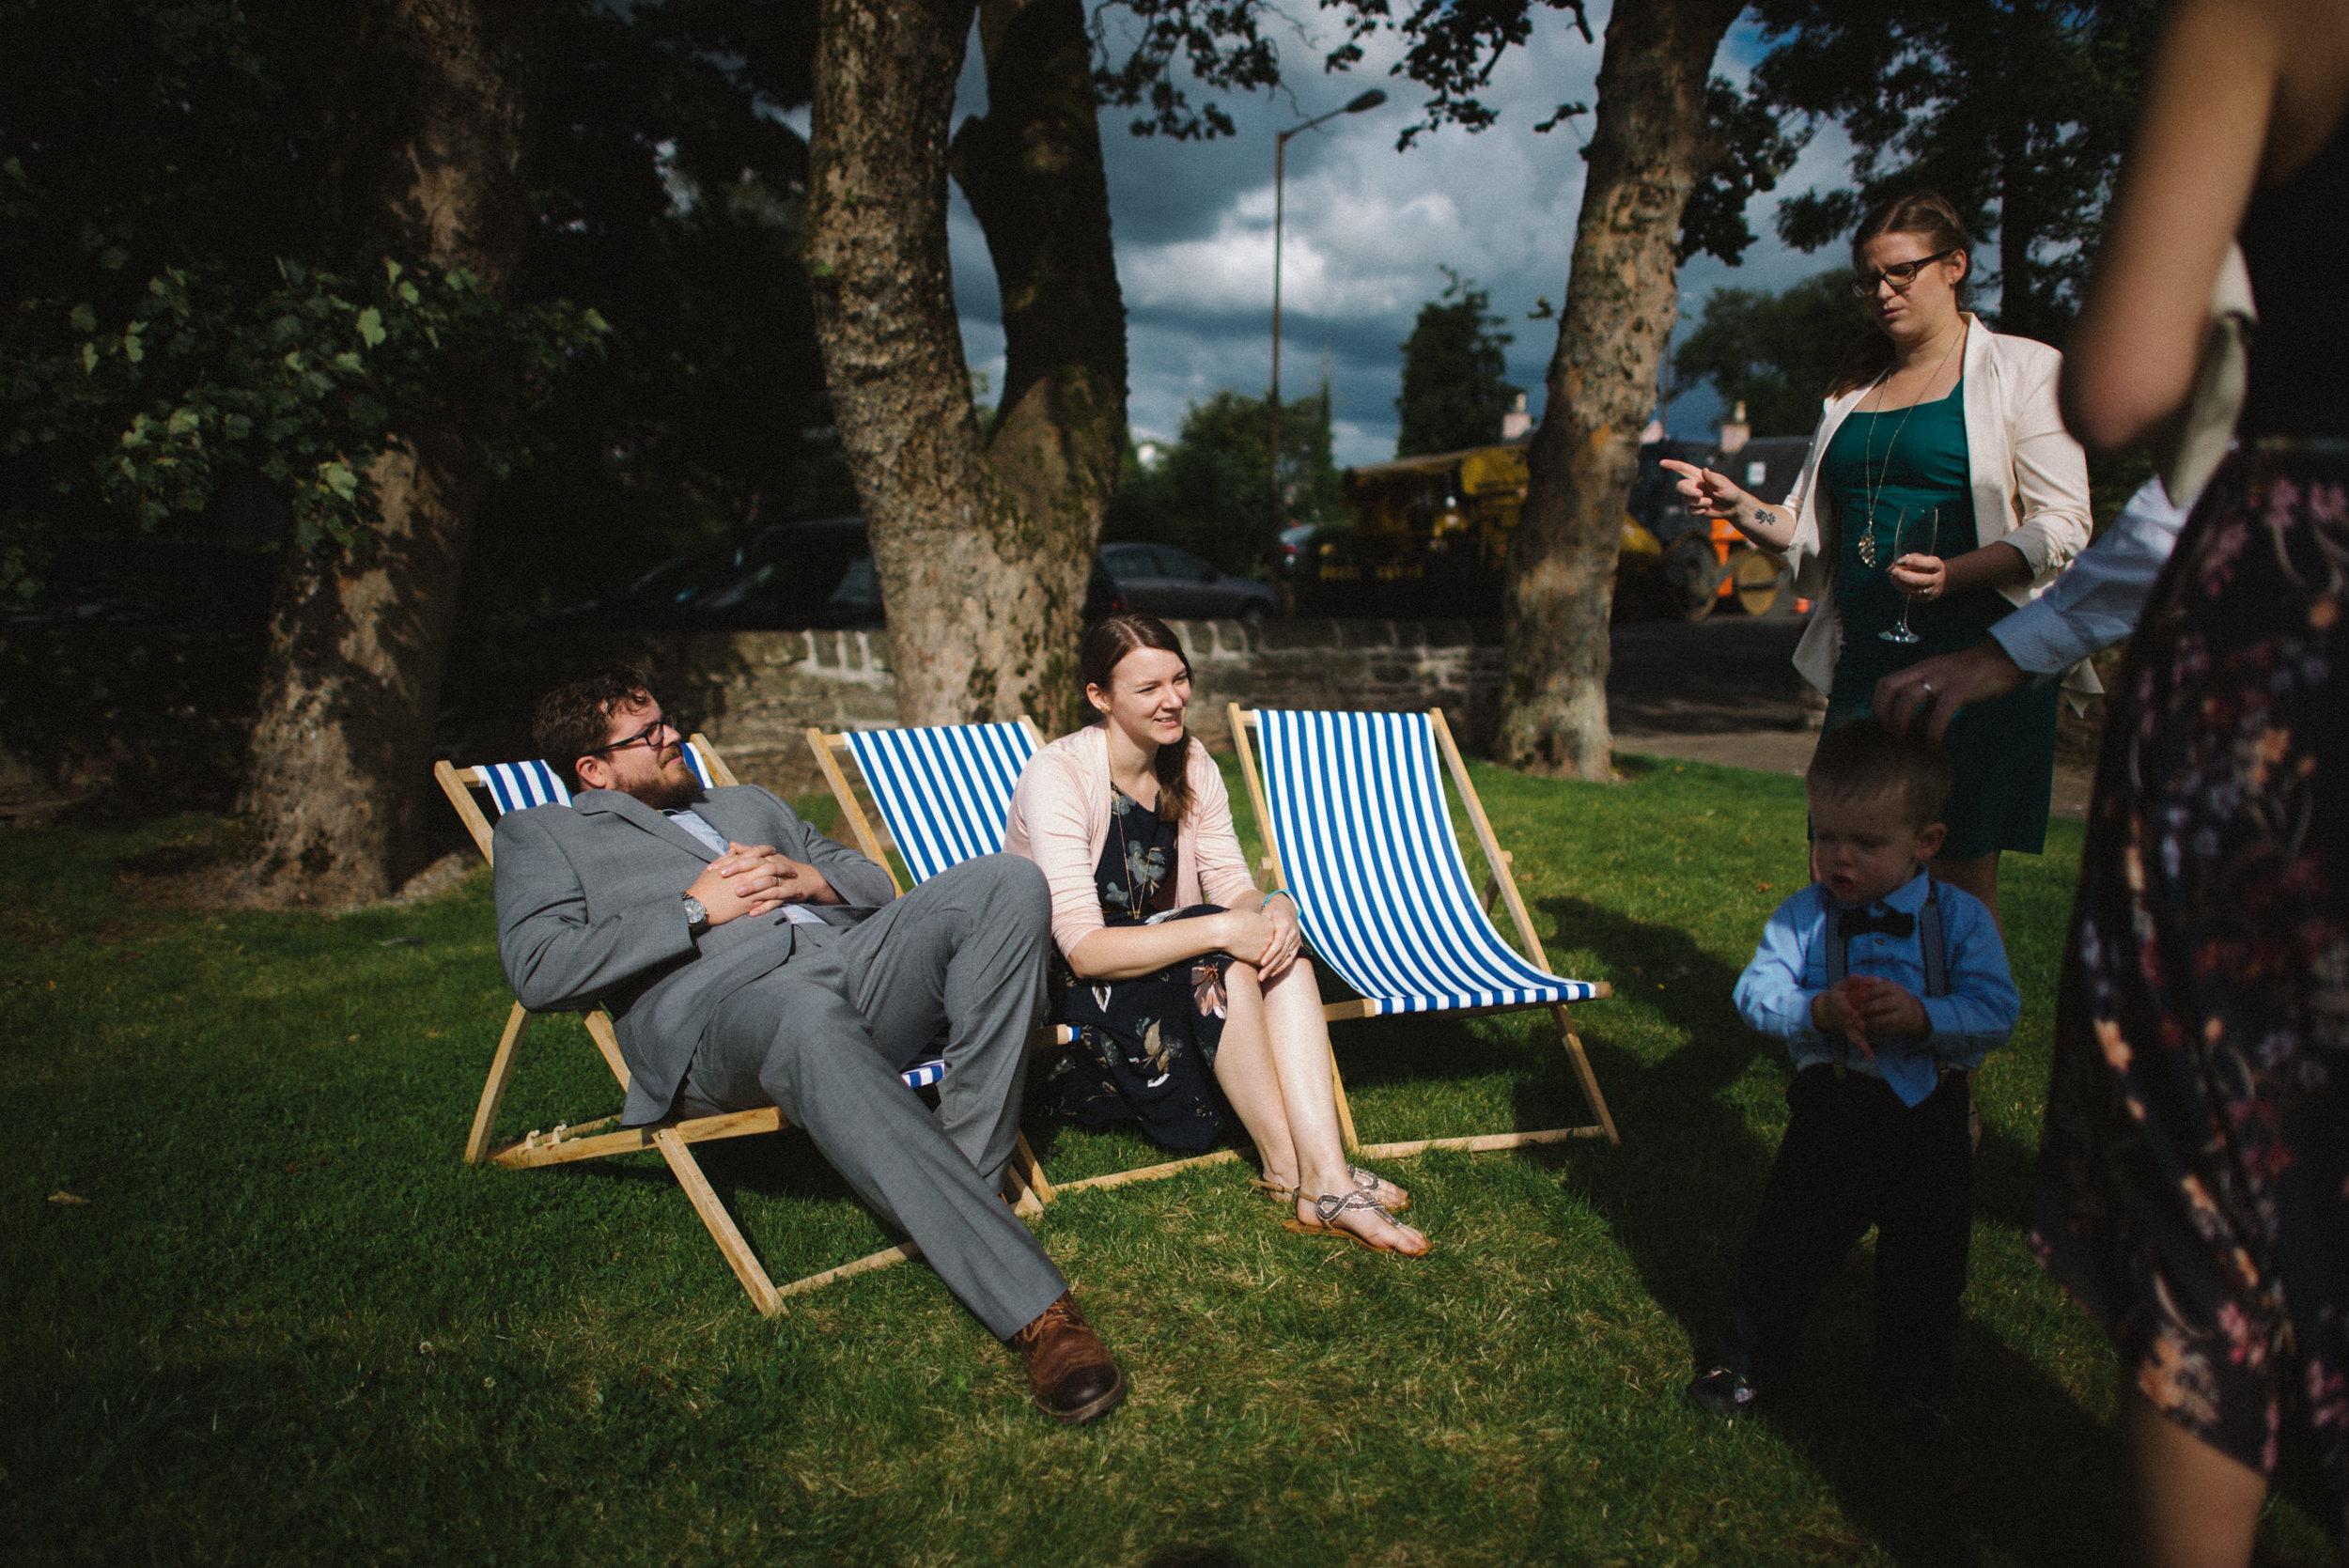 0196-LISA-DEVINE-PHOTOGRAPHY-ALTERNATIVE-WEDDING-PHOTOGRAPHY-SCOTLAND-DESTINATION-WEDDINGS-GLASGOW-WEDDINGS-COOL-WEDDINGS-STYLISH-WEDDINGS.JPG